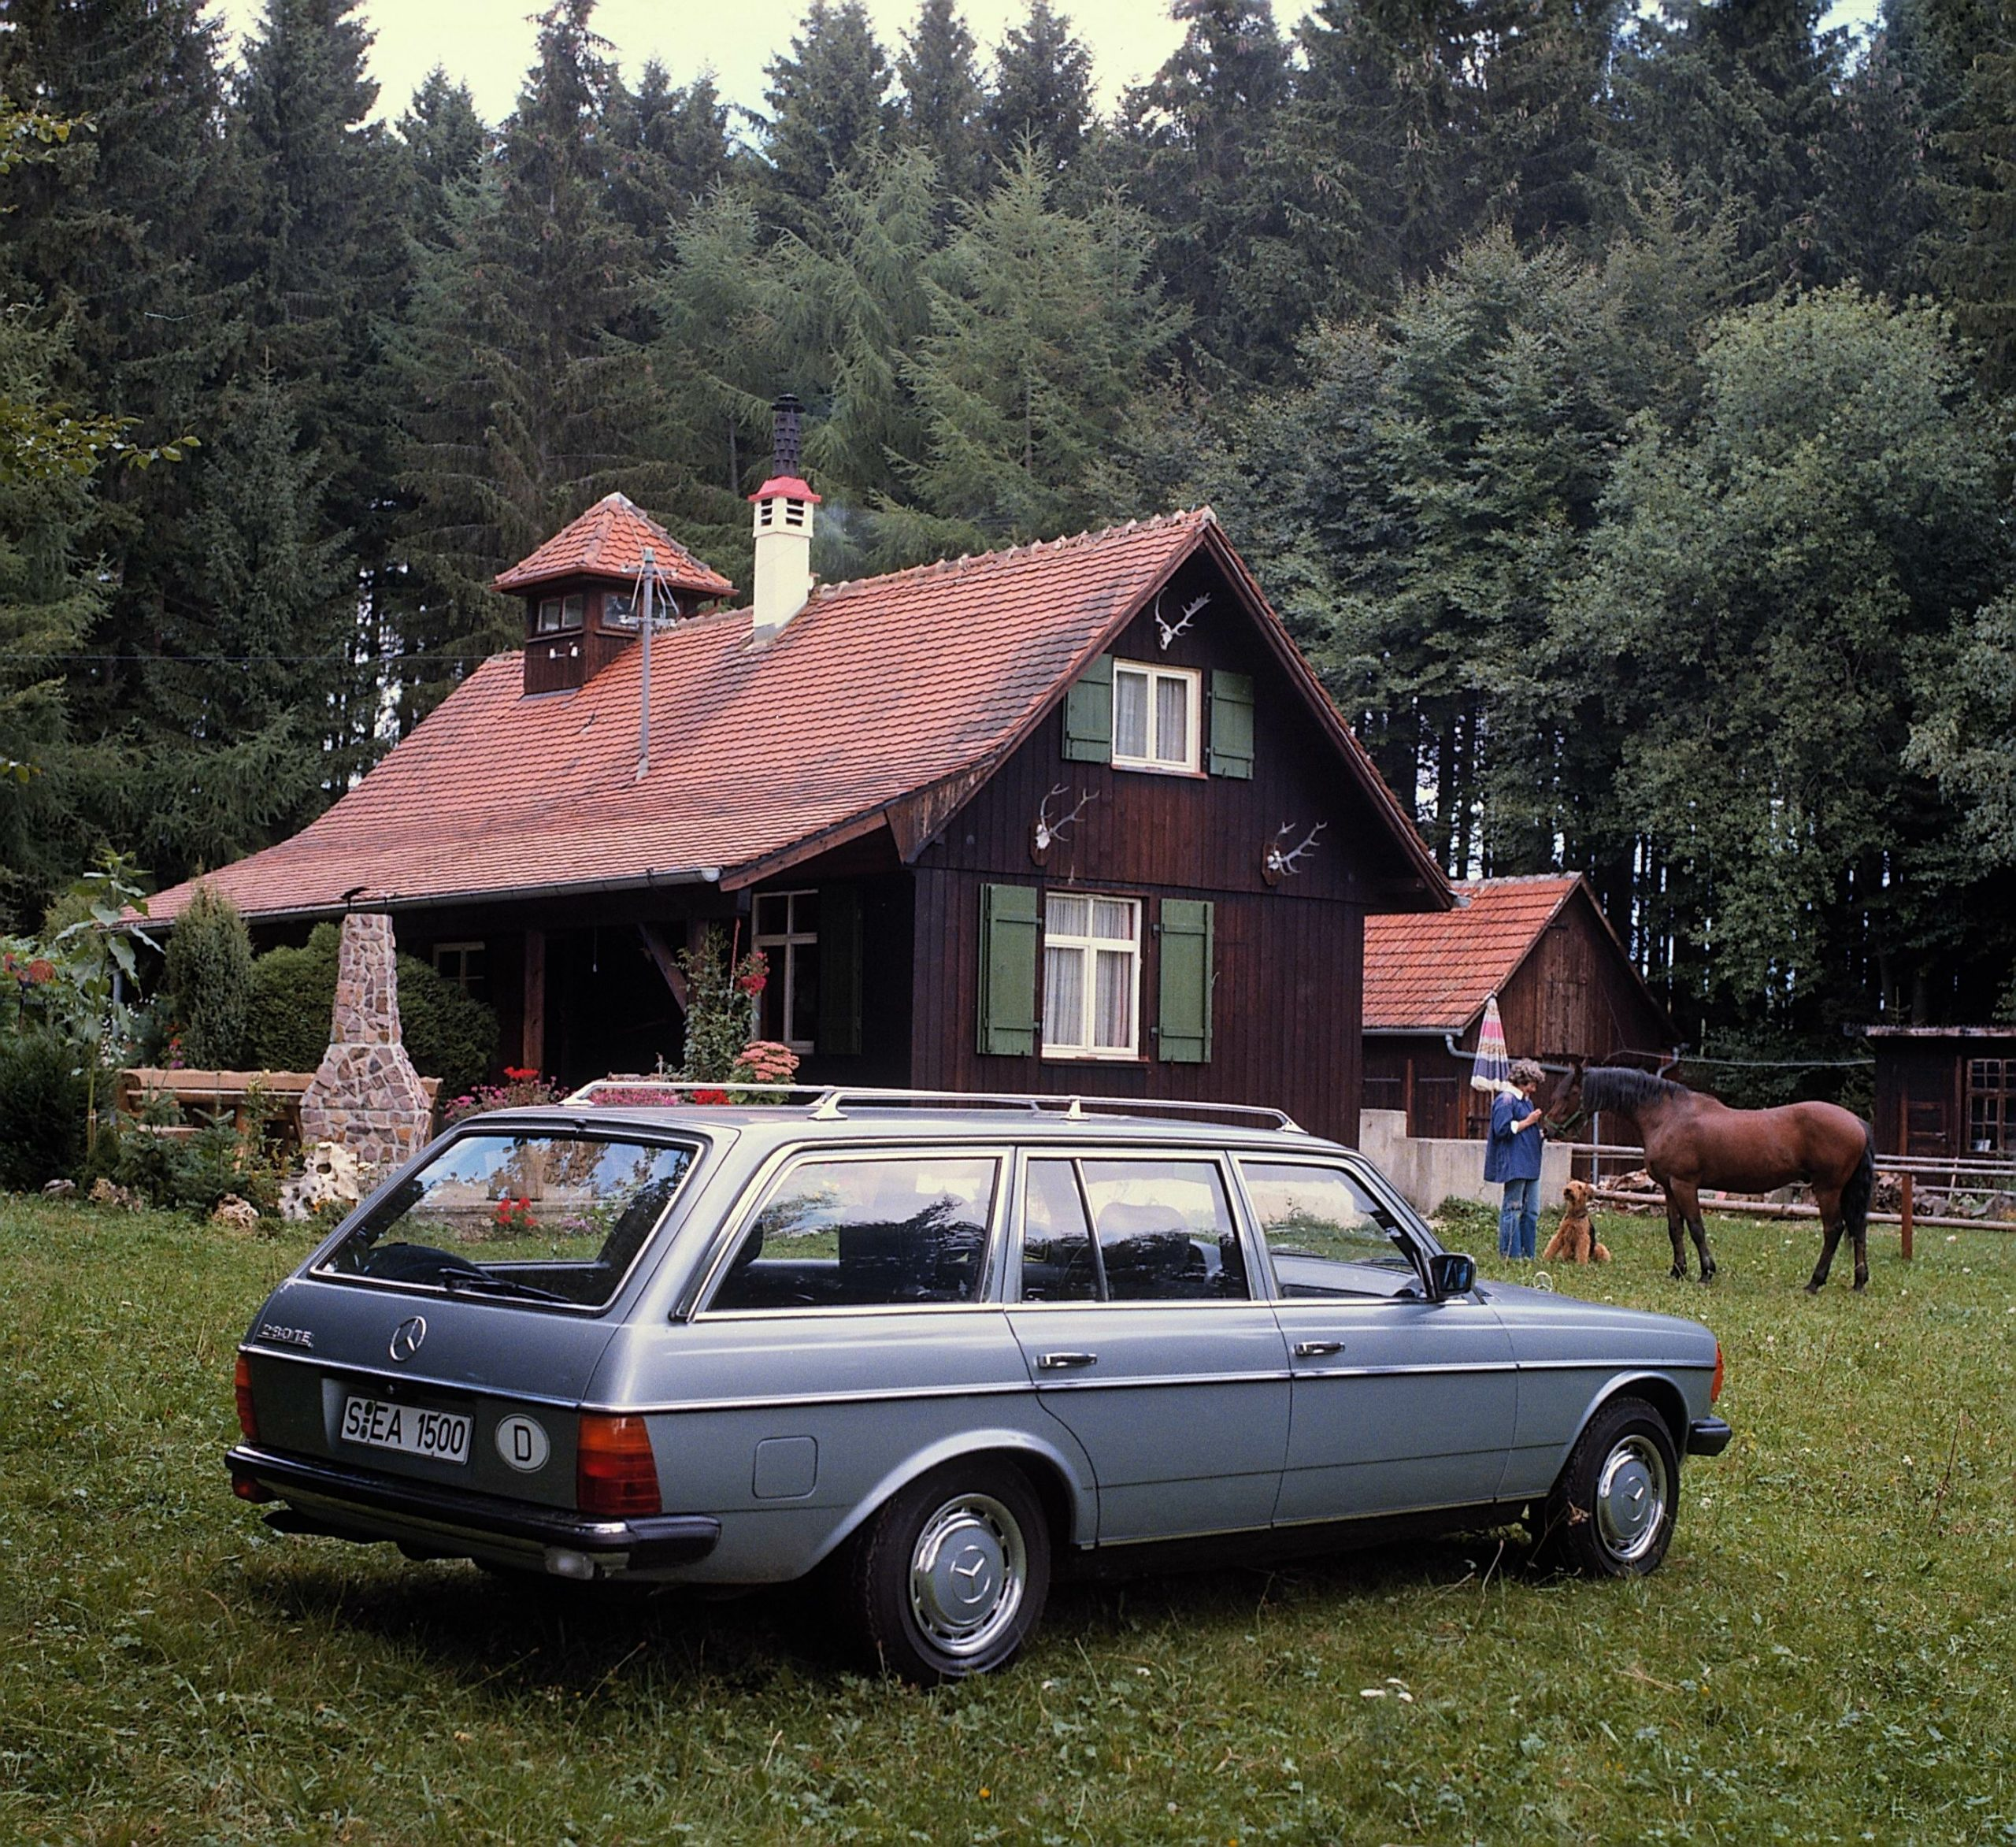 123 series station wagon Mercedes-Benz